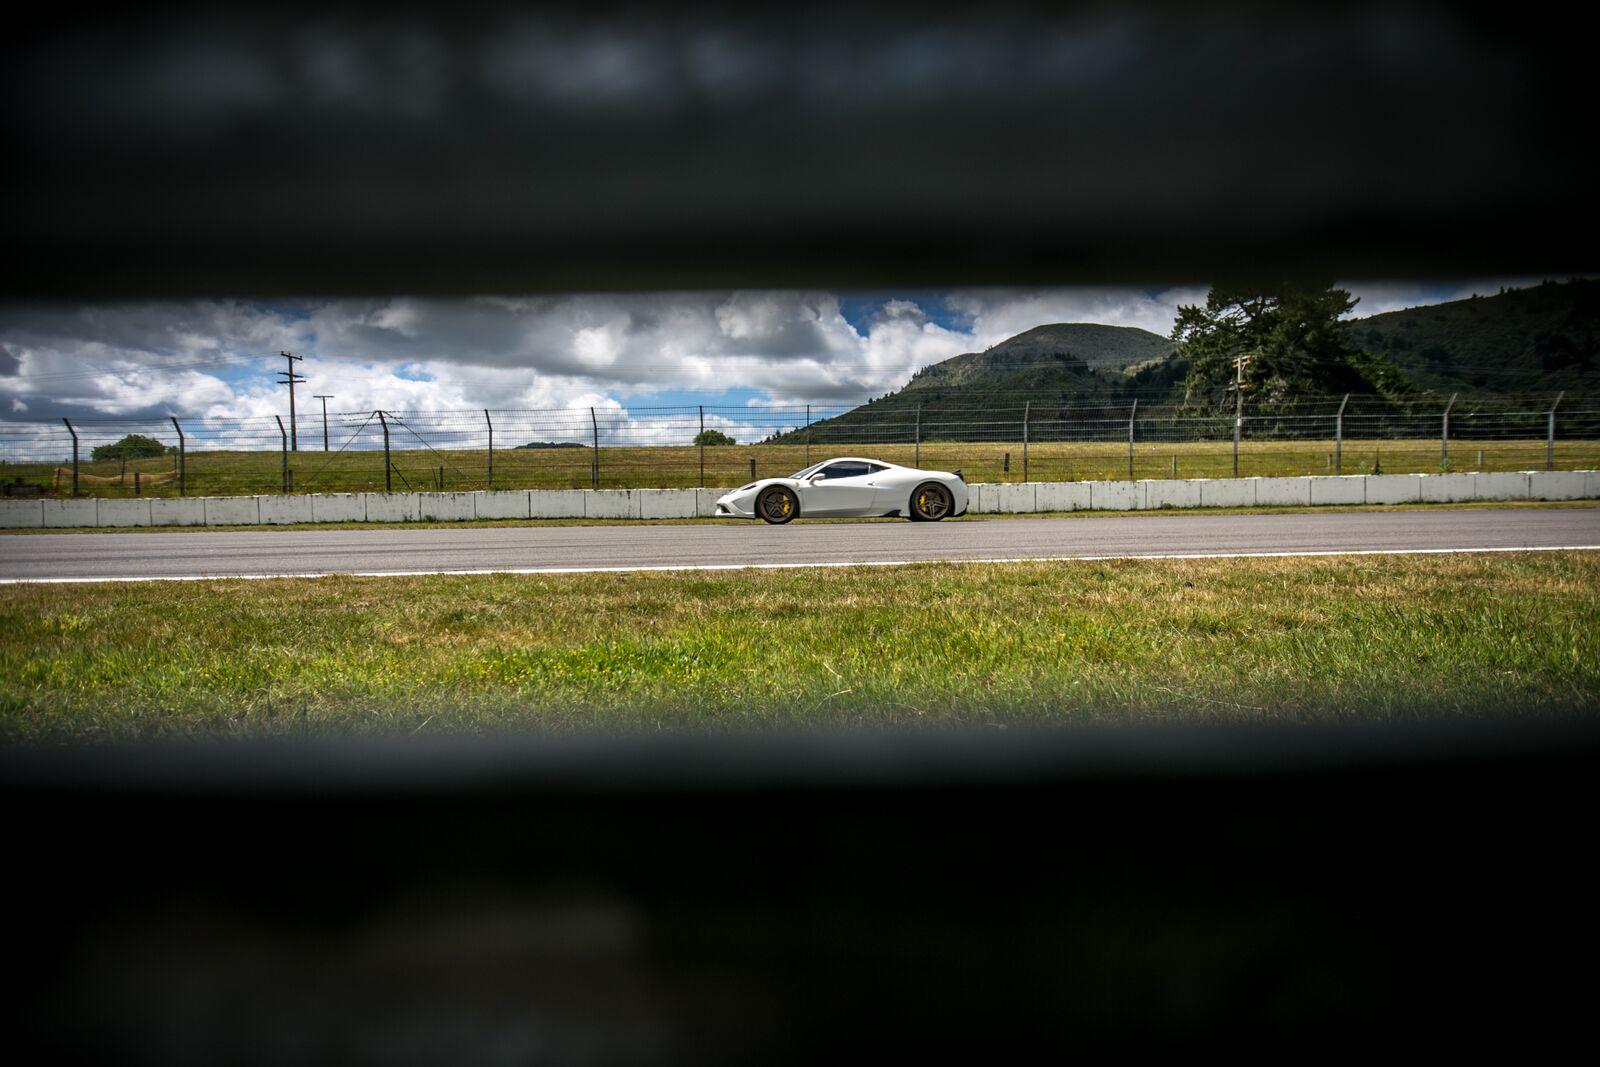 Ferrari-160_preview.jpeg